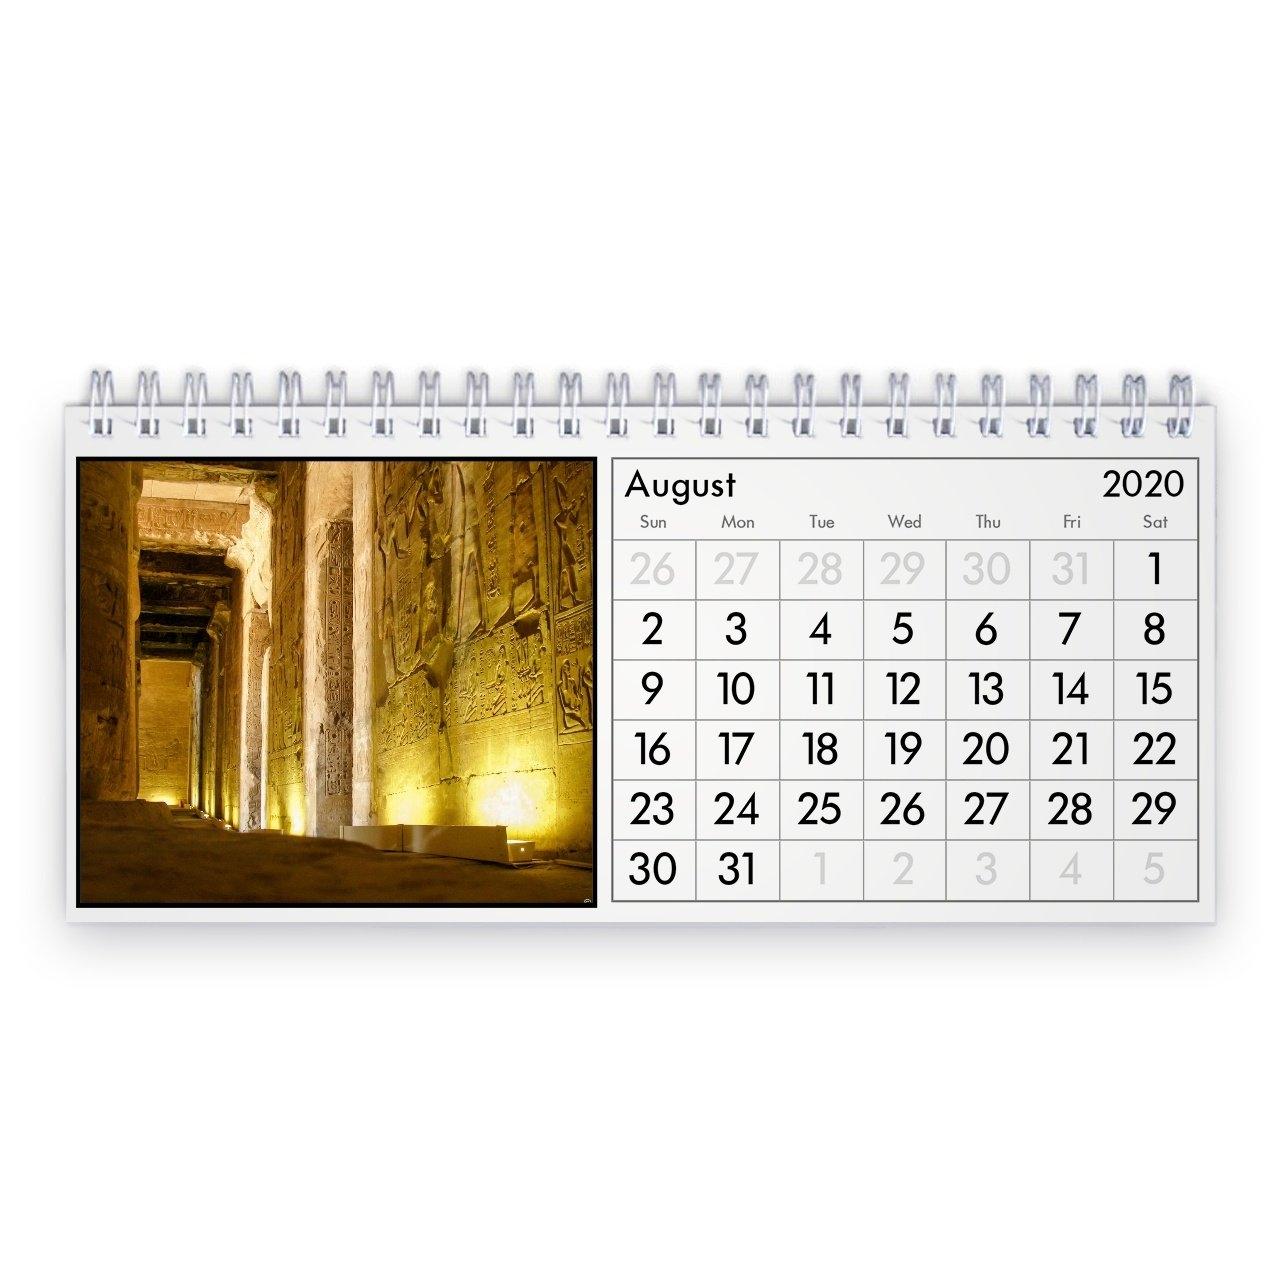 Egypt 2021 Desk Calendar pertaining to Egypt Holiday Calendar 2021